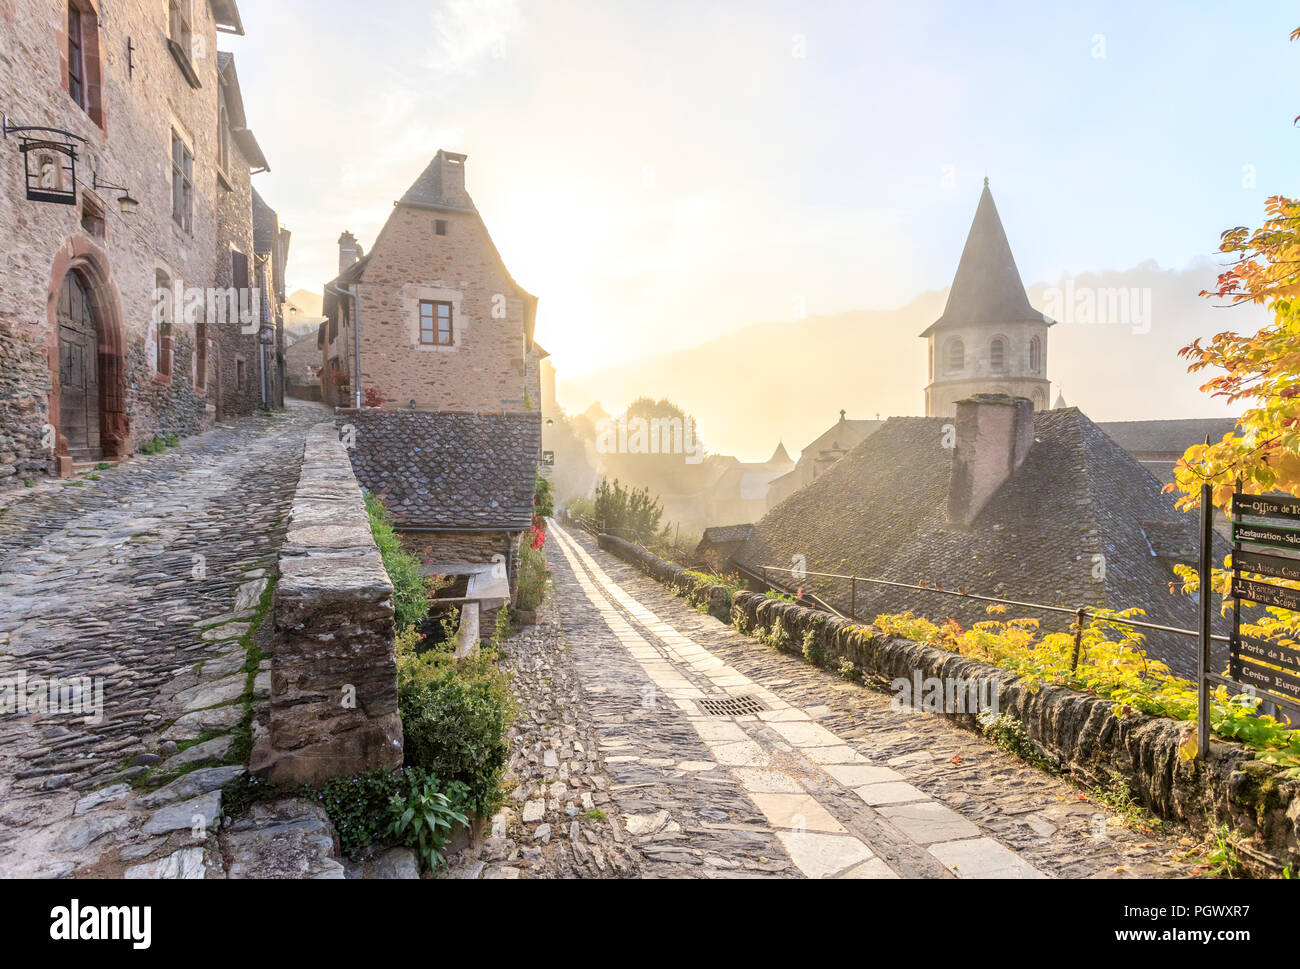 France, Aveyron, Conques, labelled Les Plus Beaux Villages de France (The Most Beautiful Villages of France), stop on El Camino de Santiago, alleyway  - Stock Image